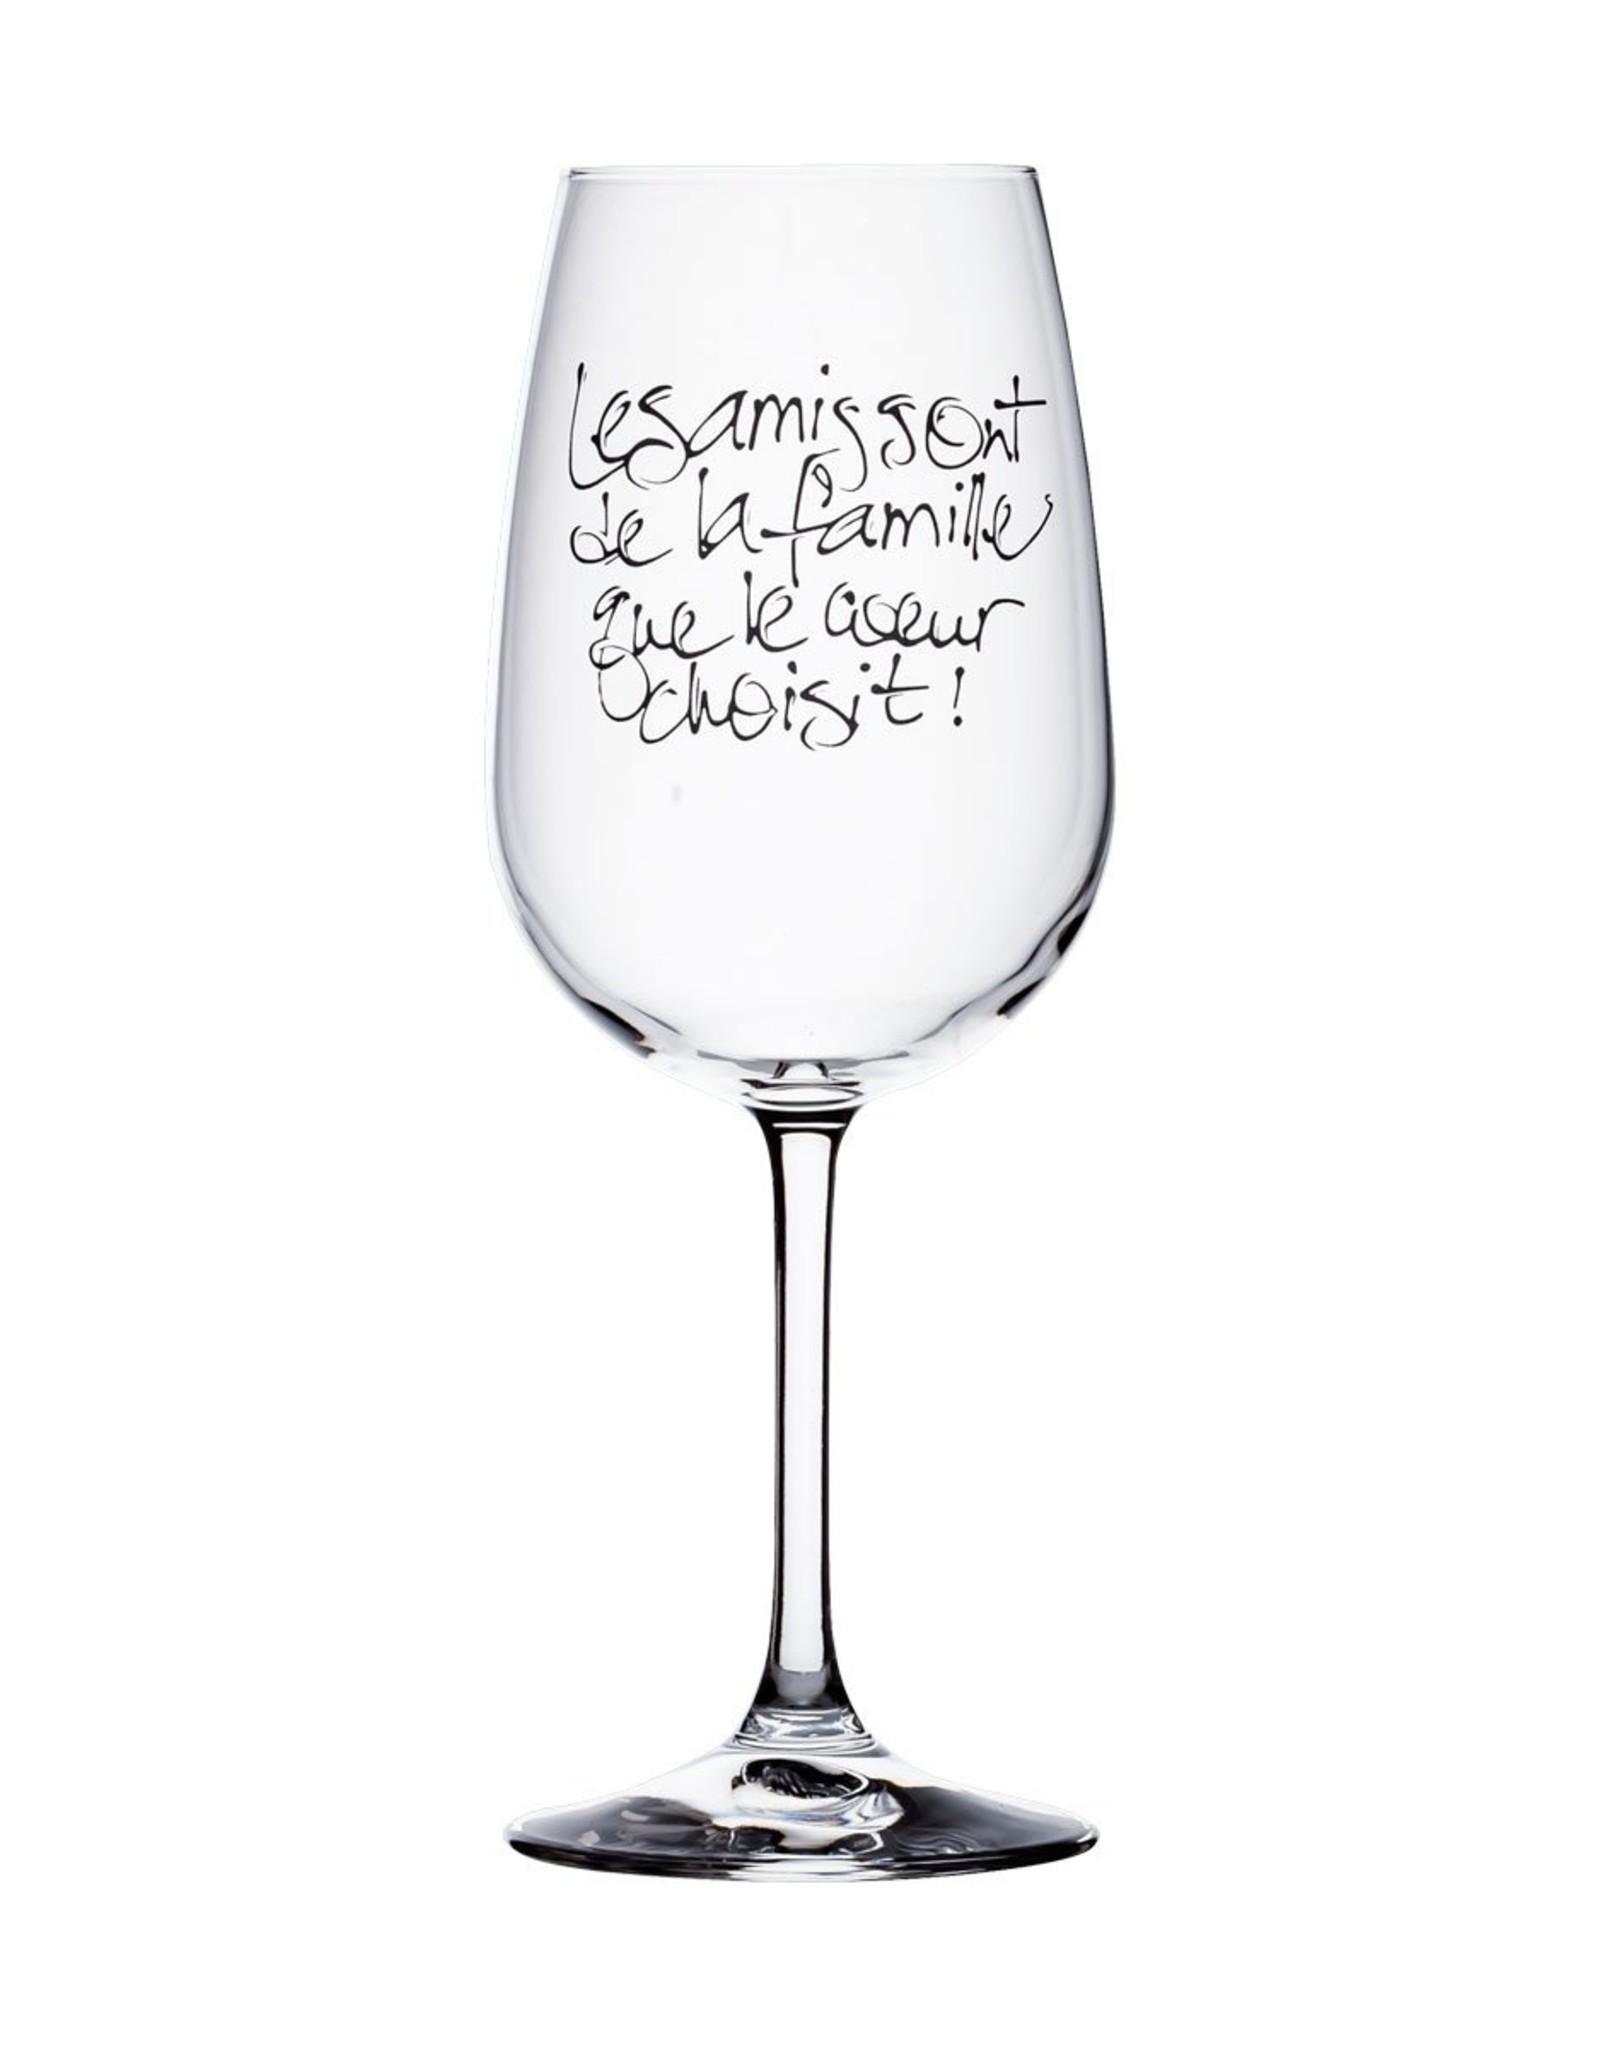 Bizzart & cie Verre à vin  robe Blanche   - Amis